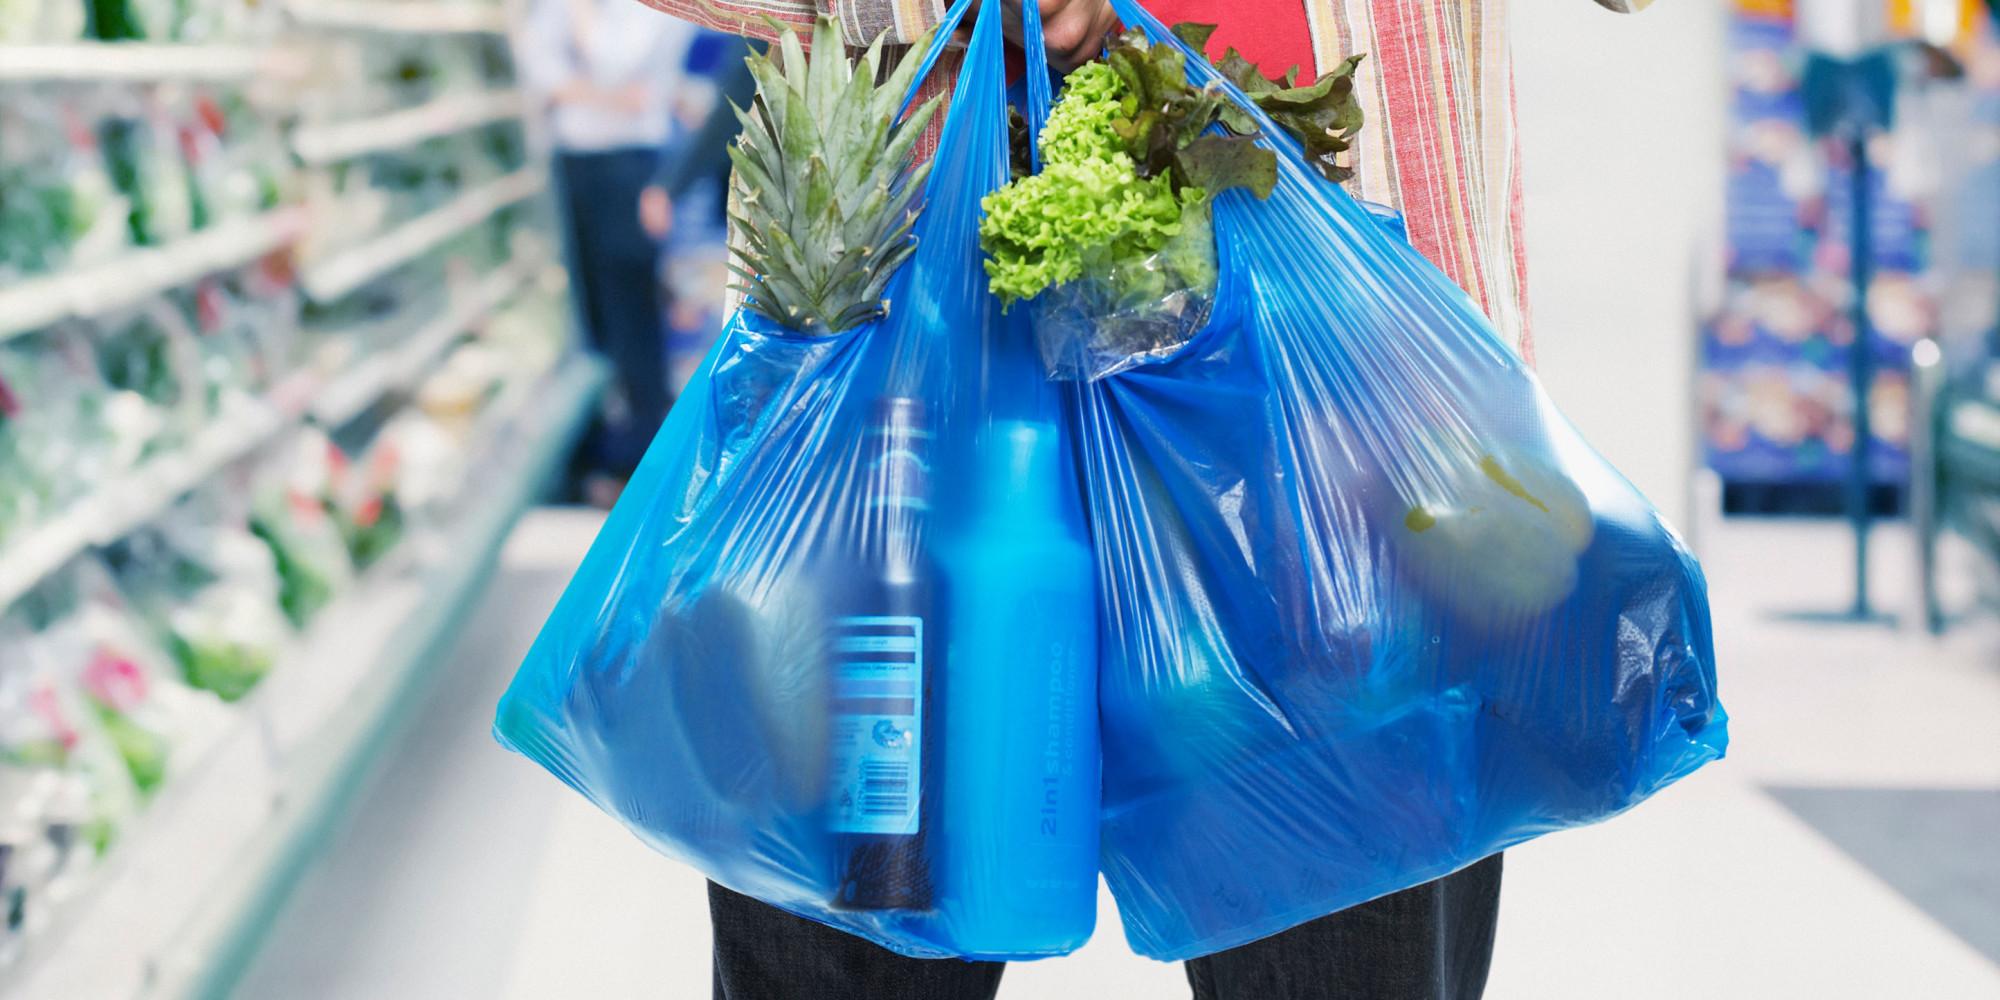 Greece's IELKA survey proves plastic bags' use decline